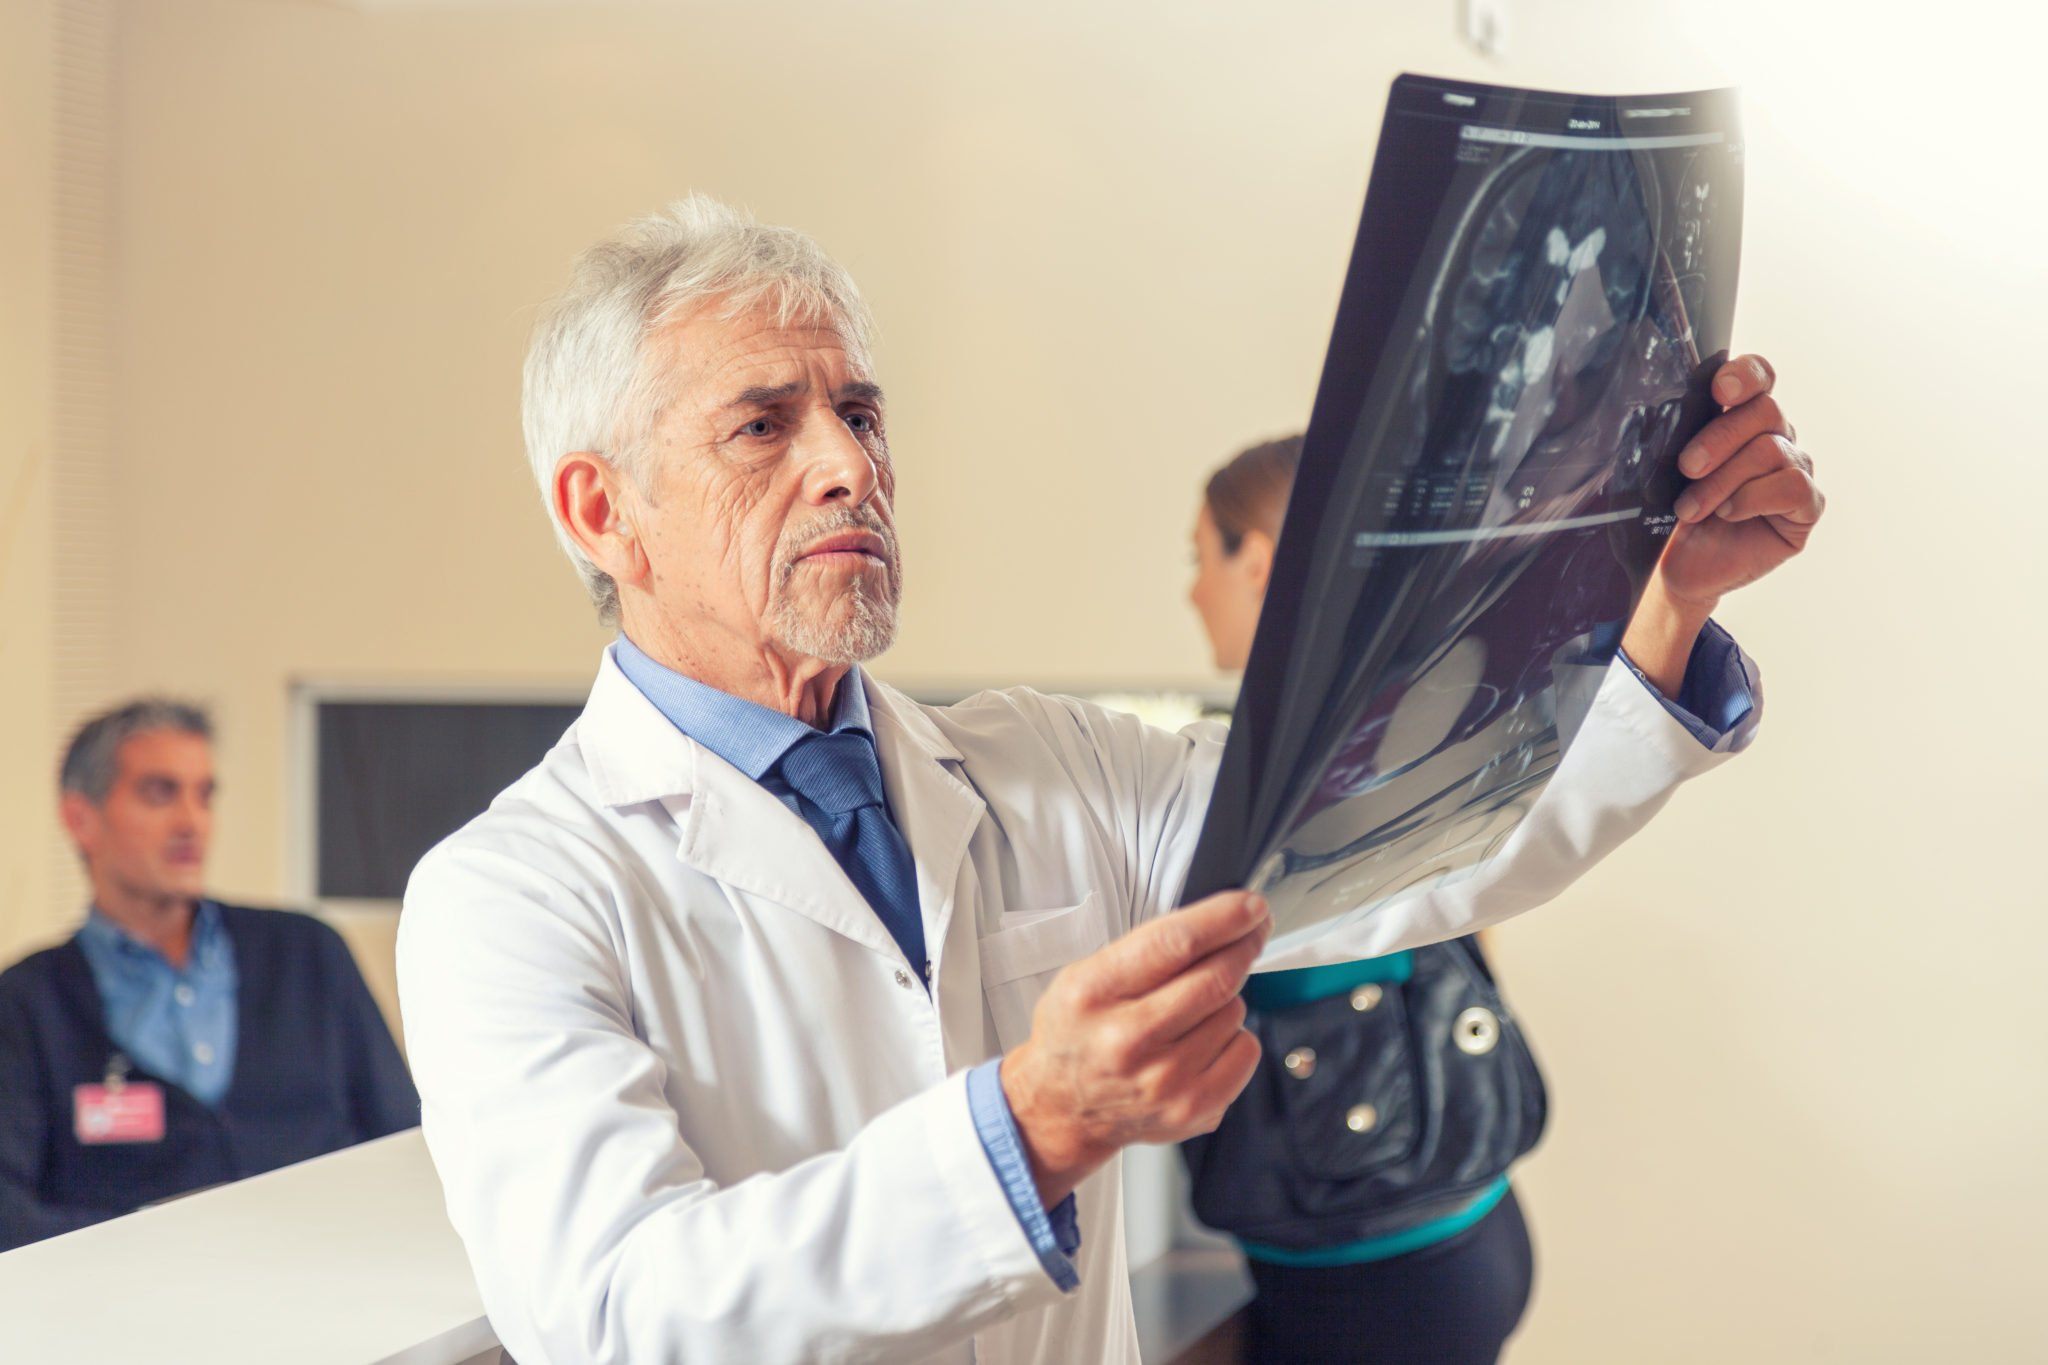 Orthopaedic surgeons